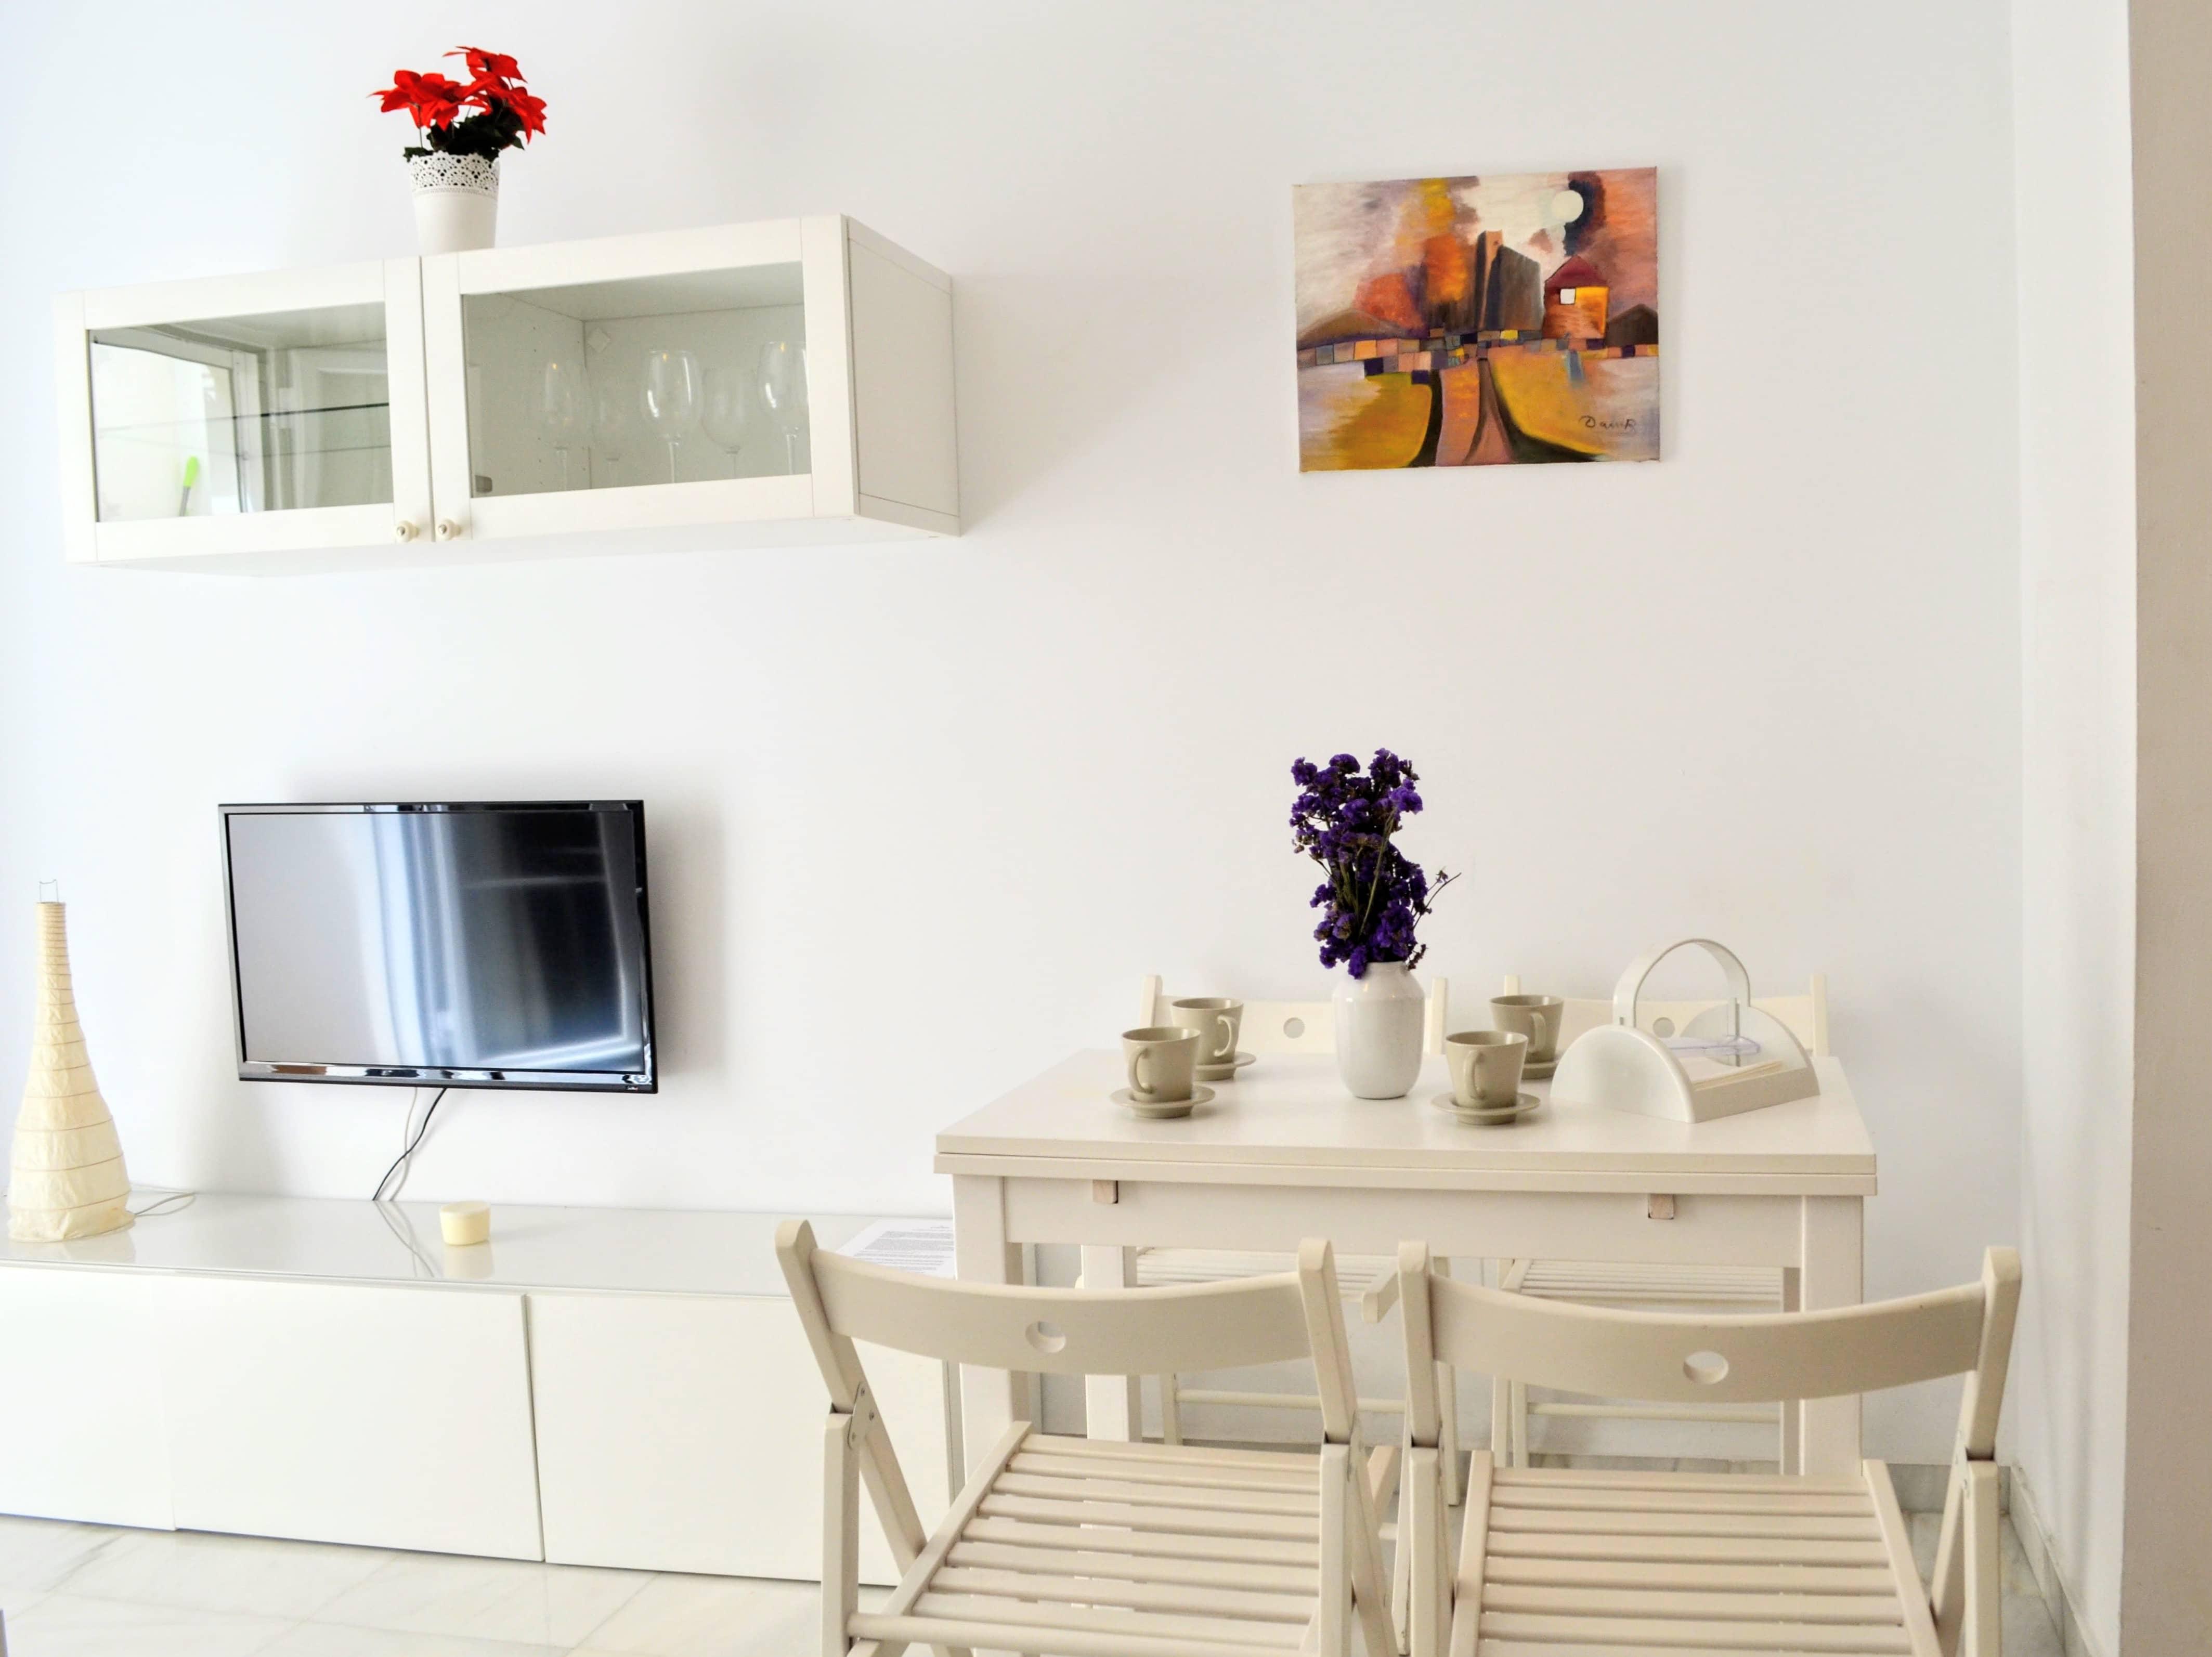 Balneario con dormitorio y terraza privada  0414